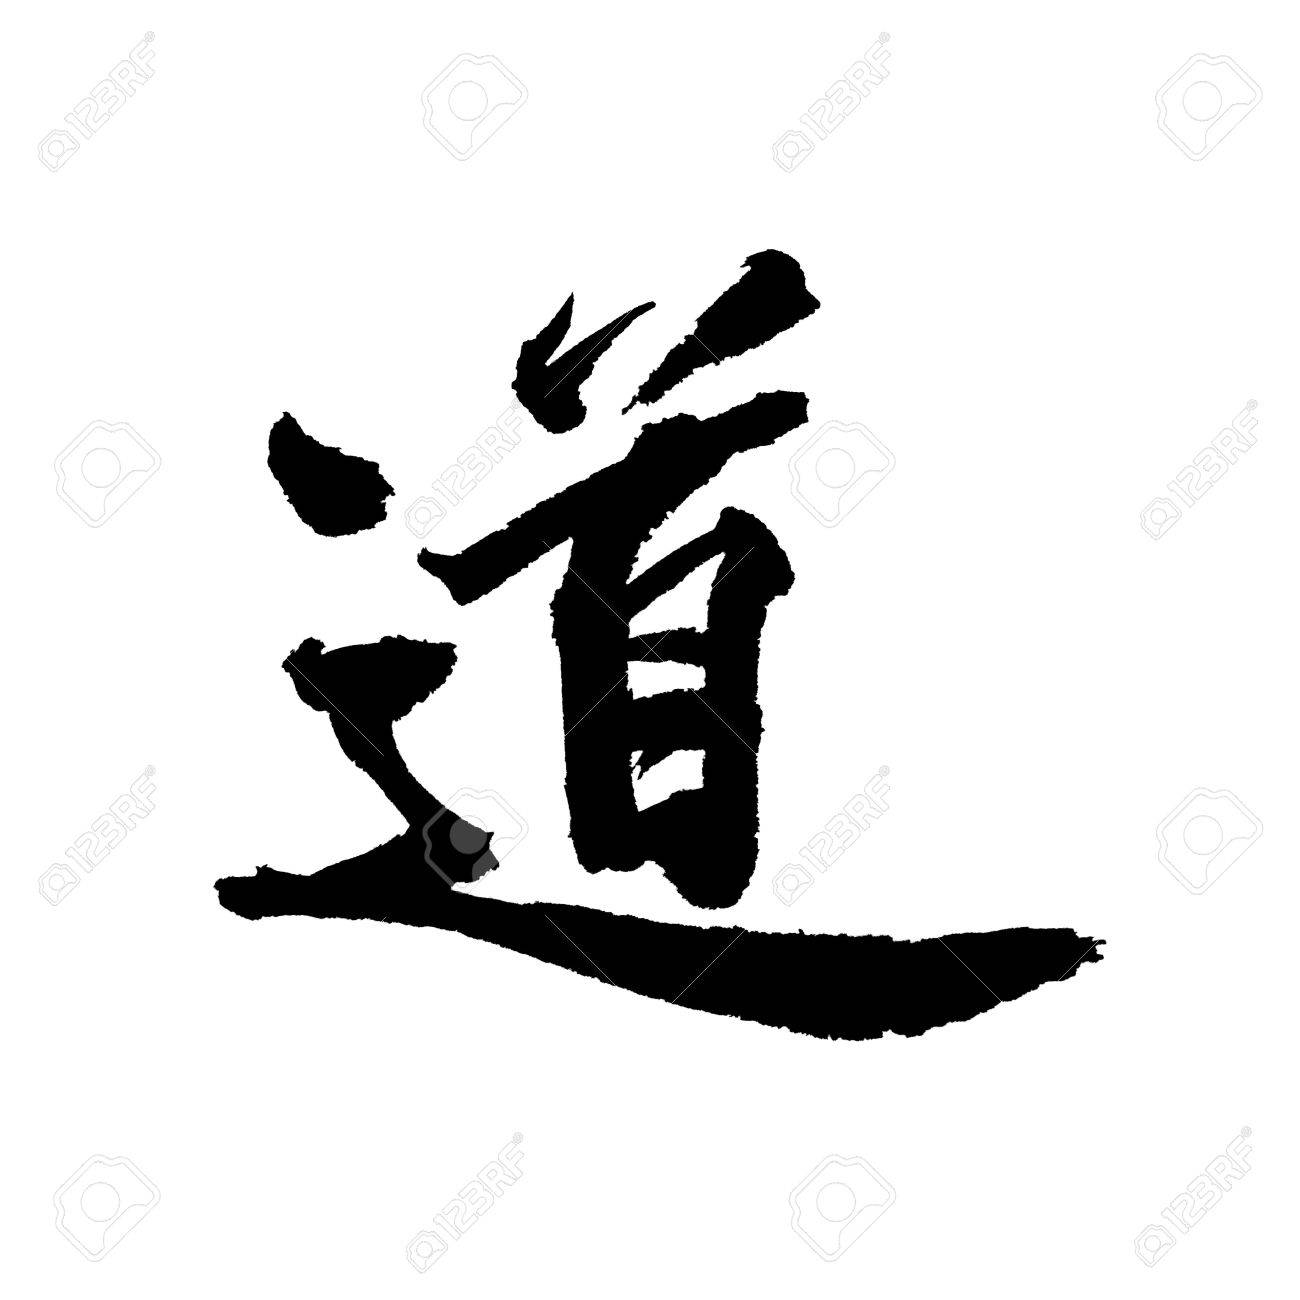 I CHING -este-carácter-chino-significa-tao-tao-taoísmo-con-trazado-de-recorte